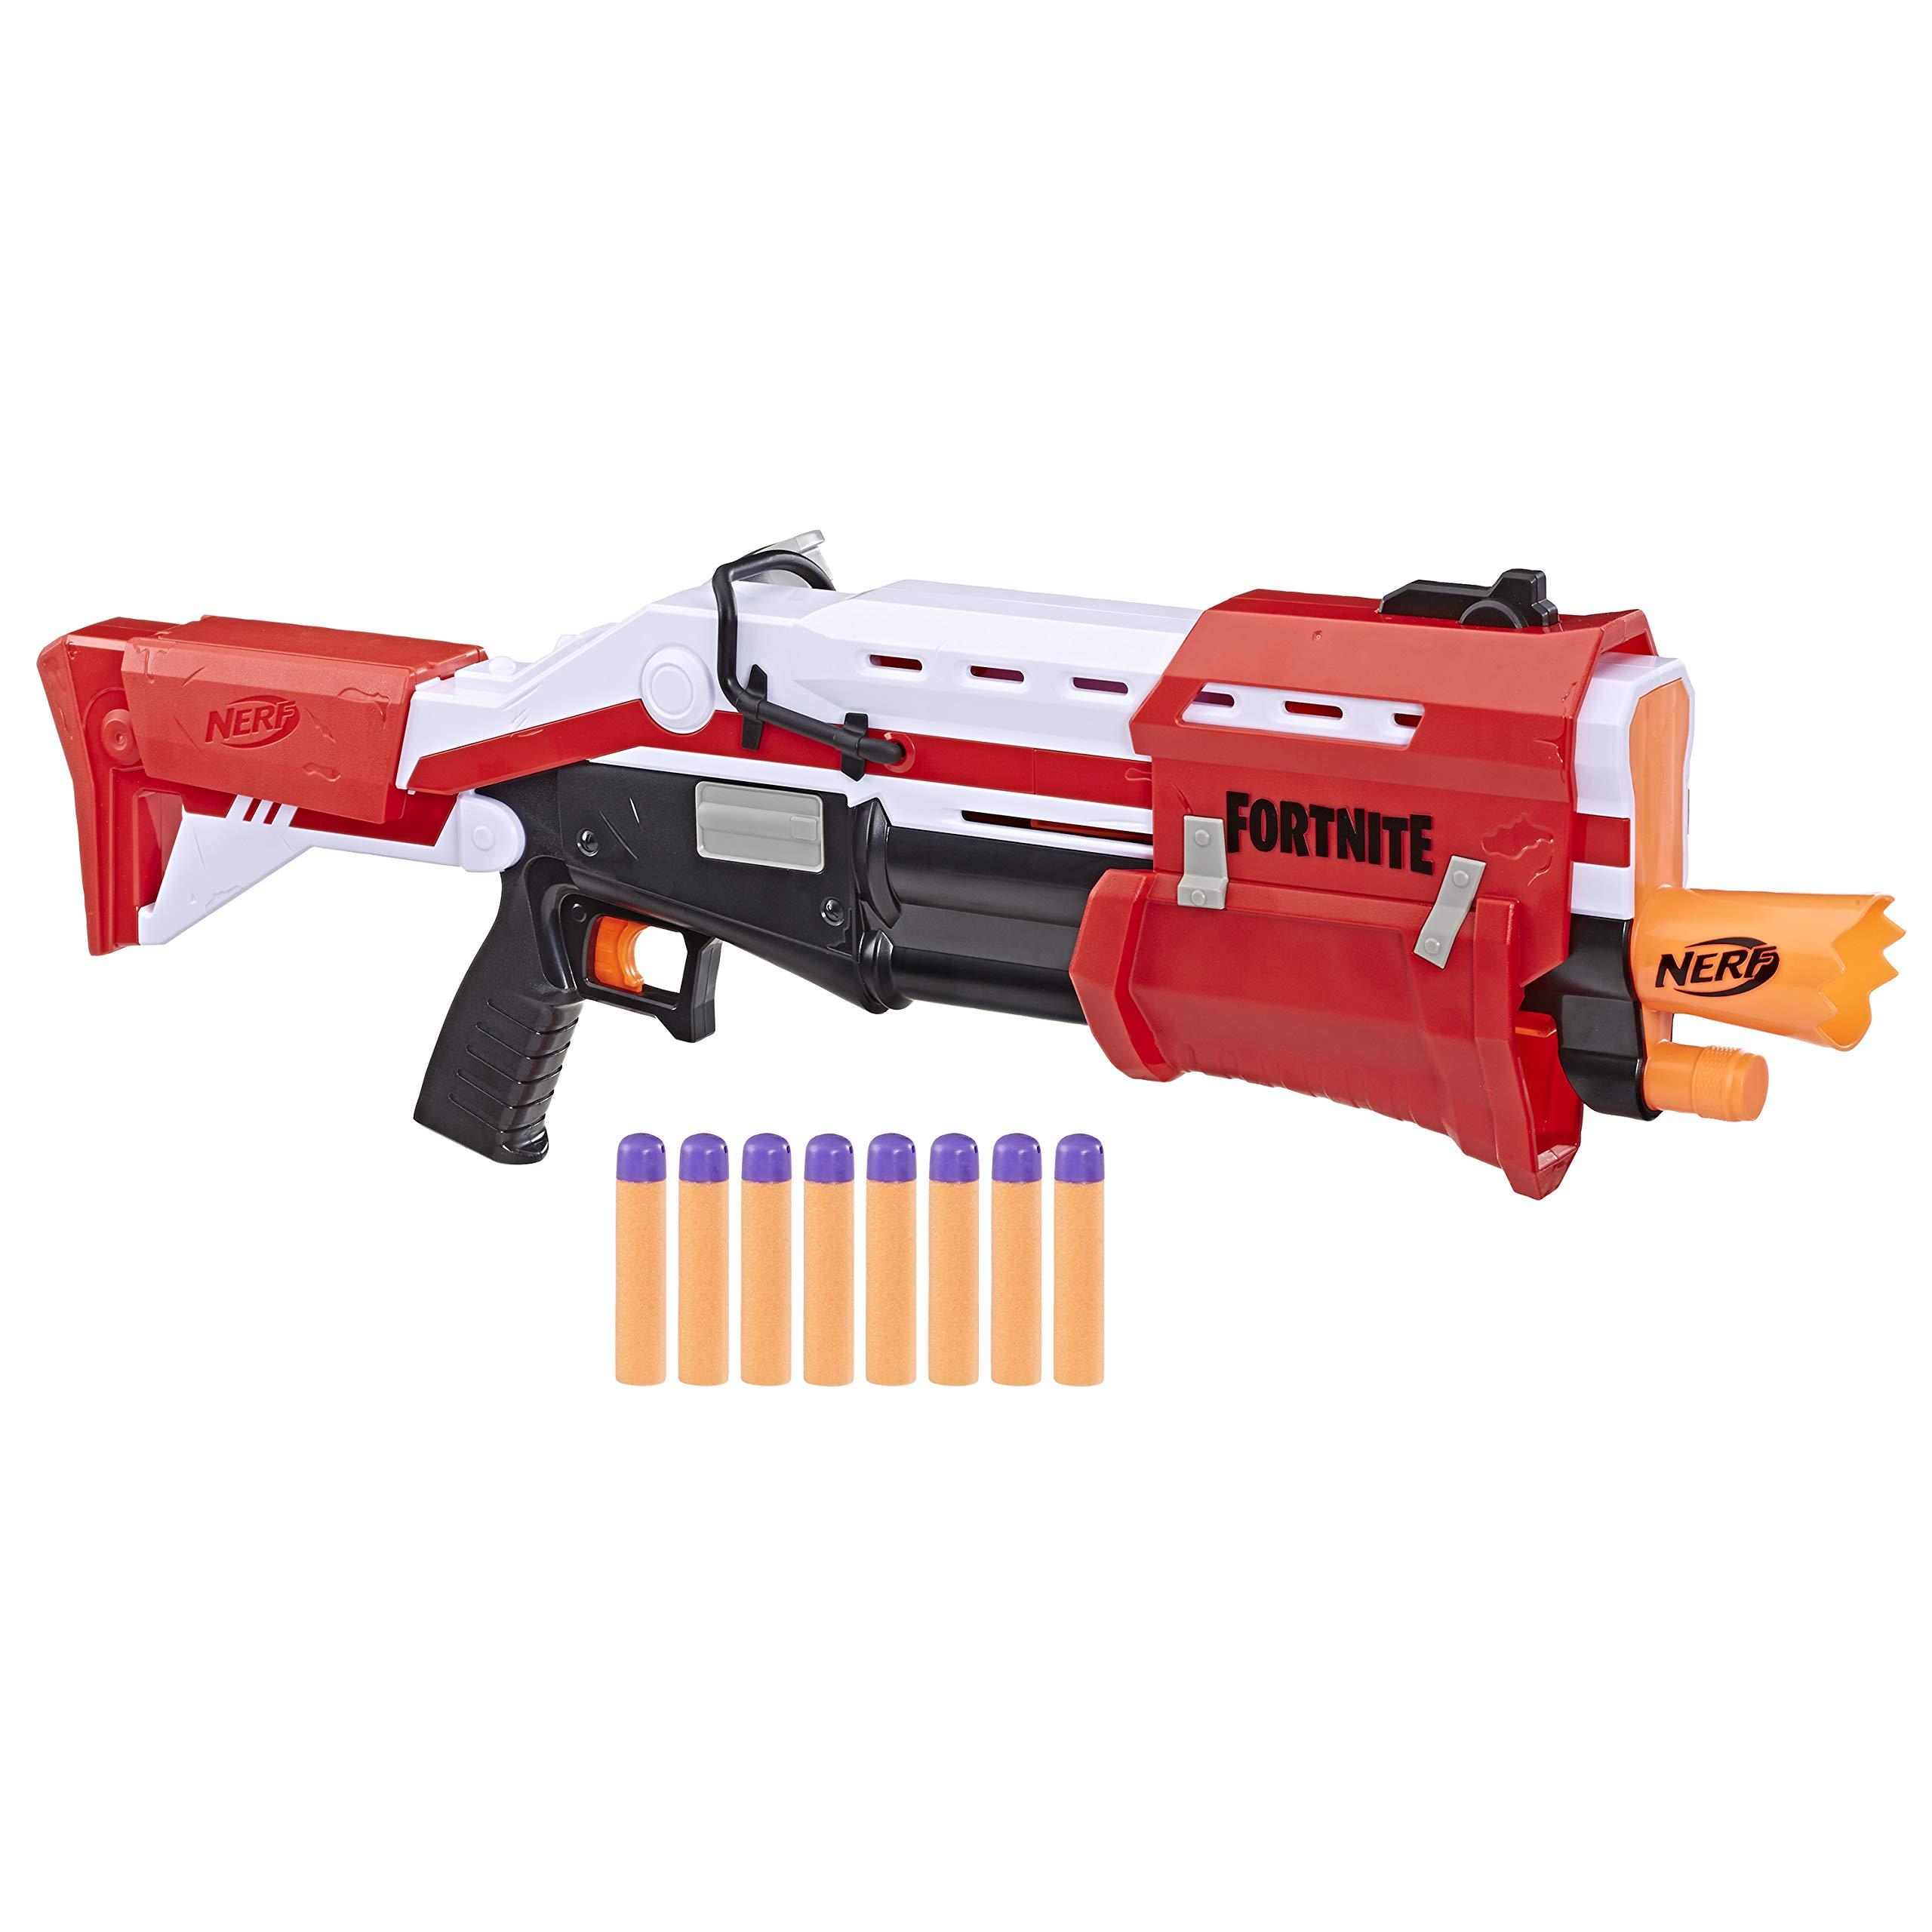 Nerf Fortnite TS-1 Blaster by NERF (Image #1)